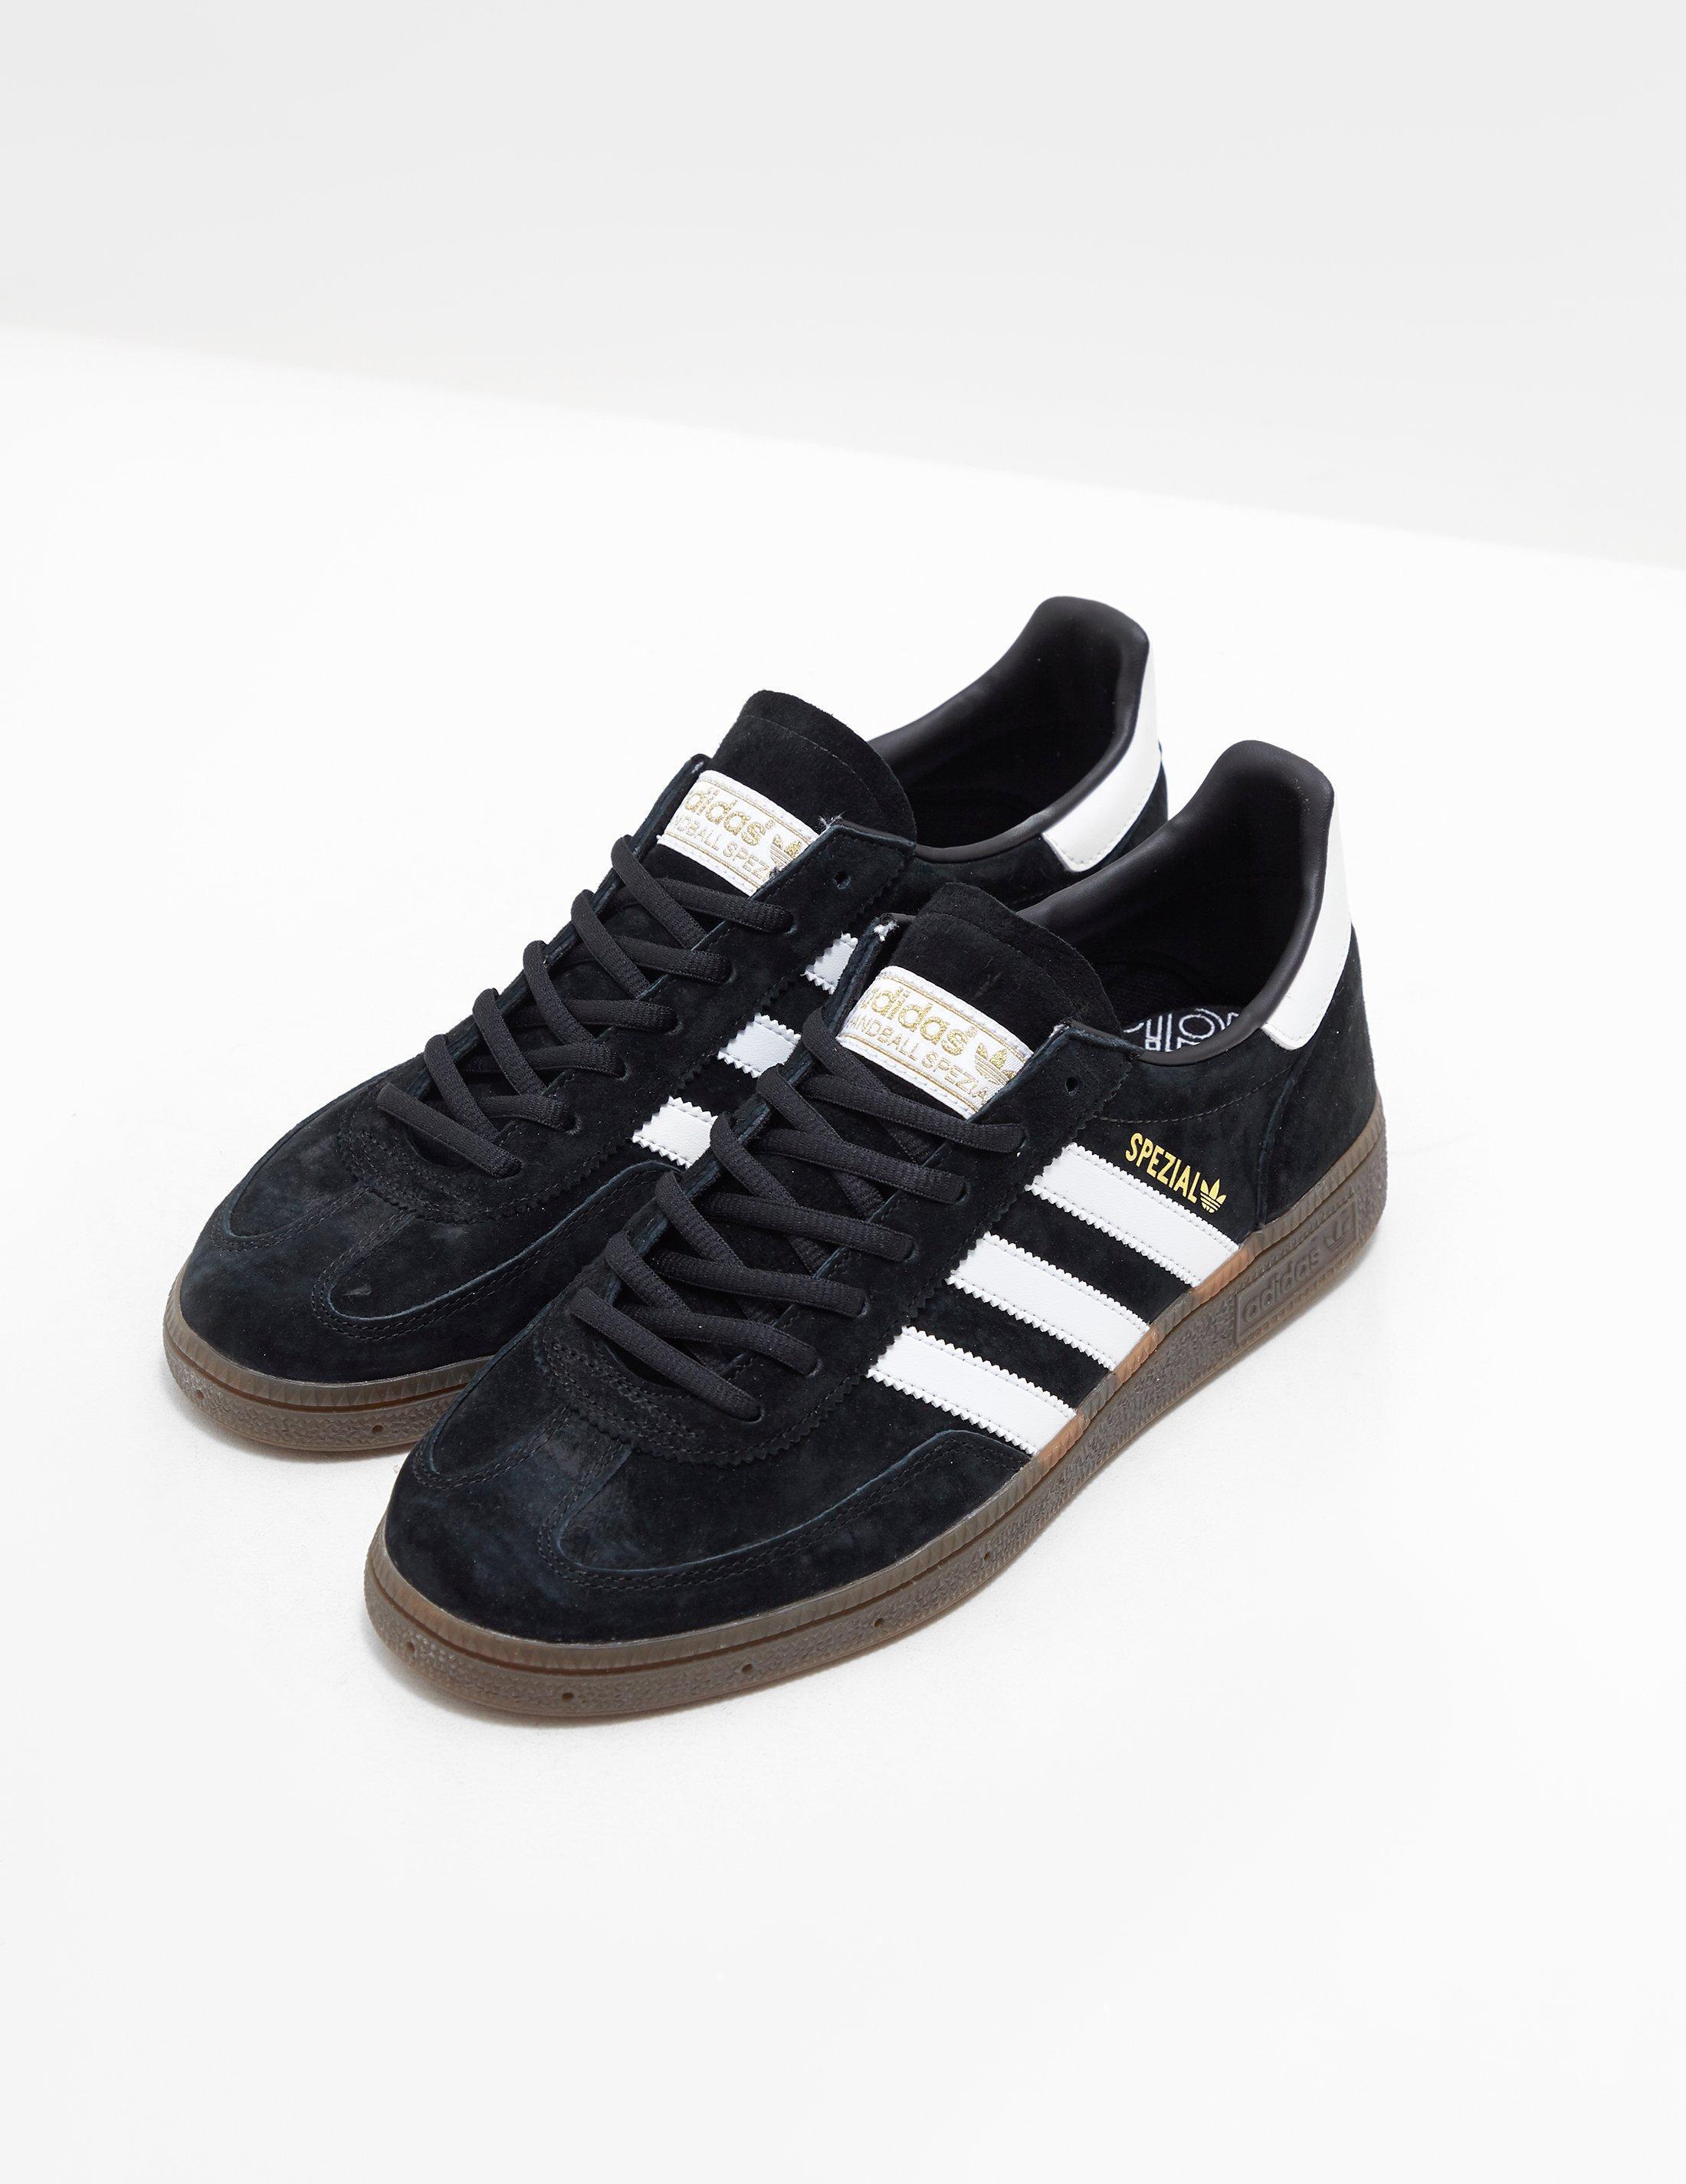 online store 15134 286fd adidas Originals. Mens Handball Spezial Black